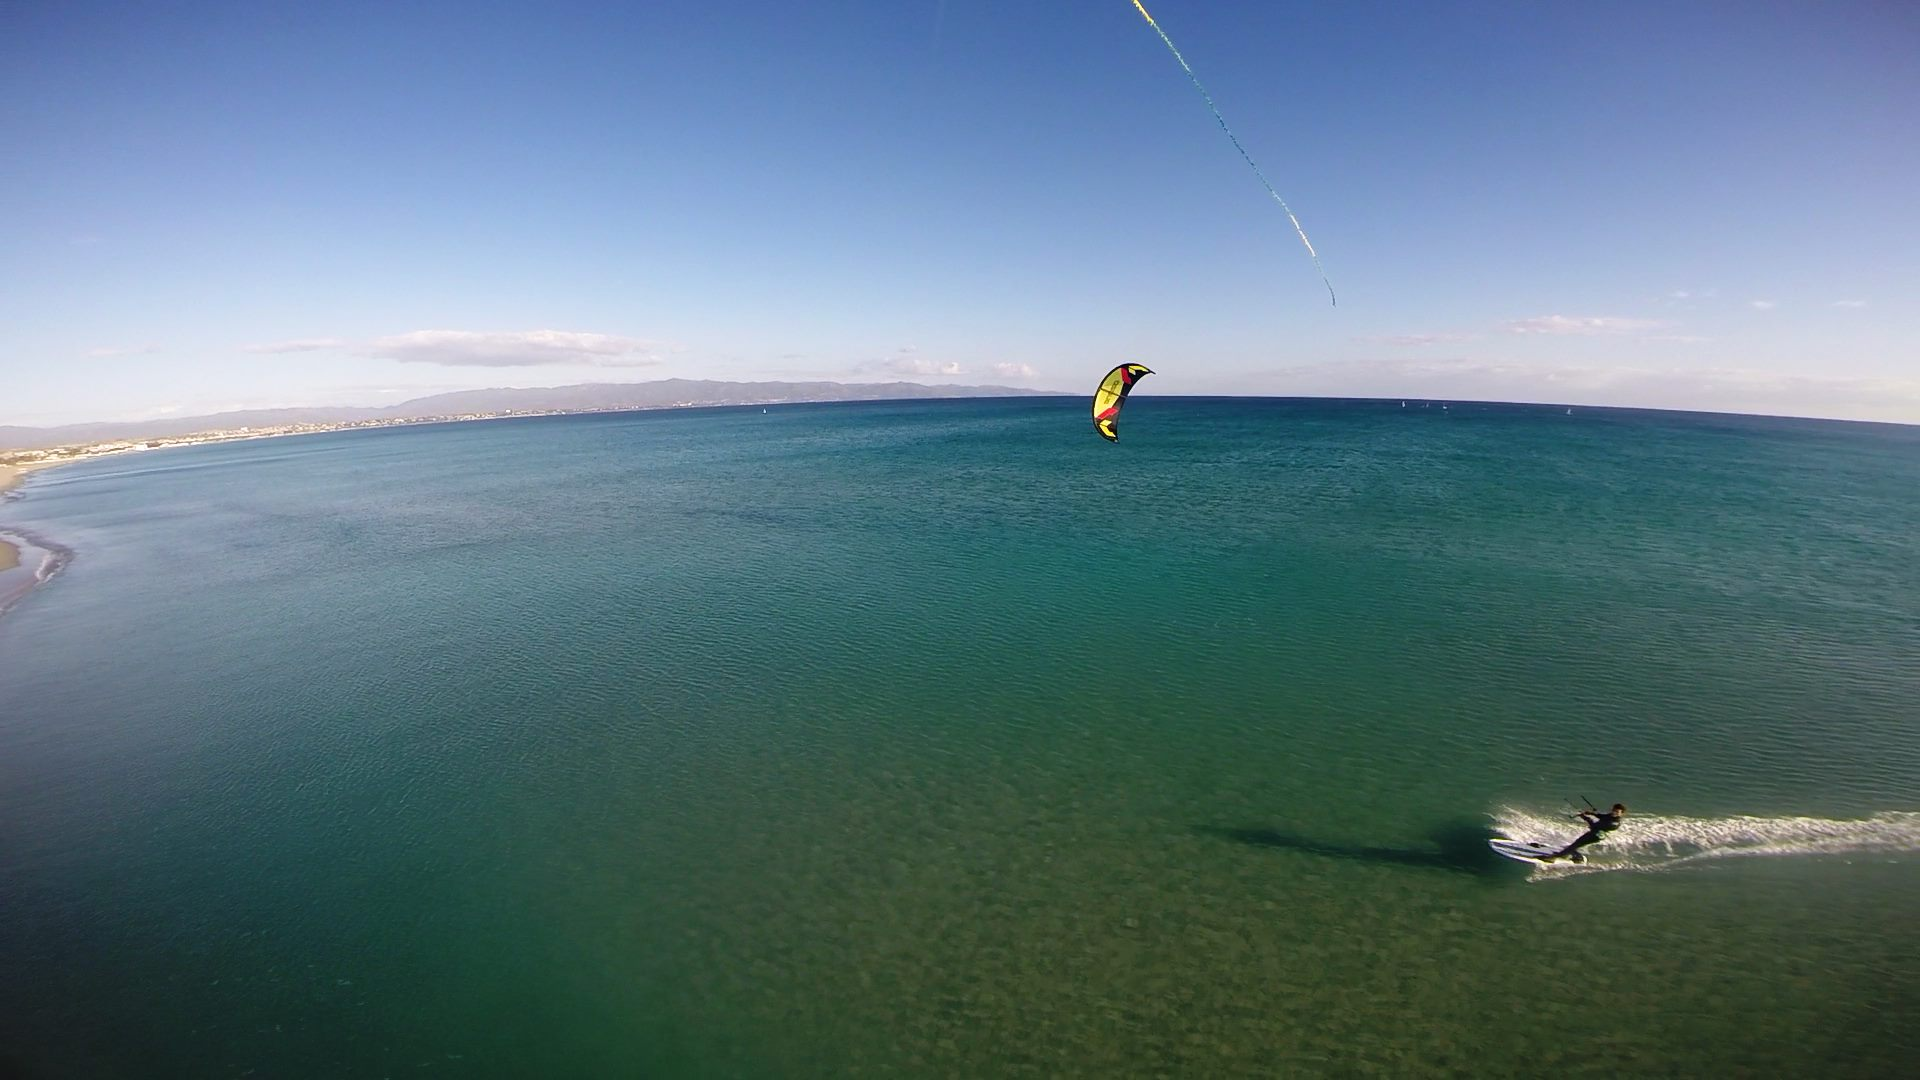 Kitesurfing Poetto | Cagliari, Sardinia